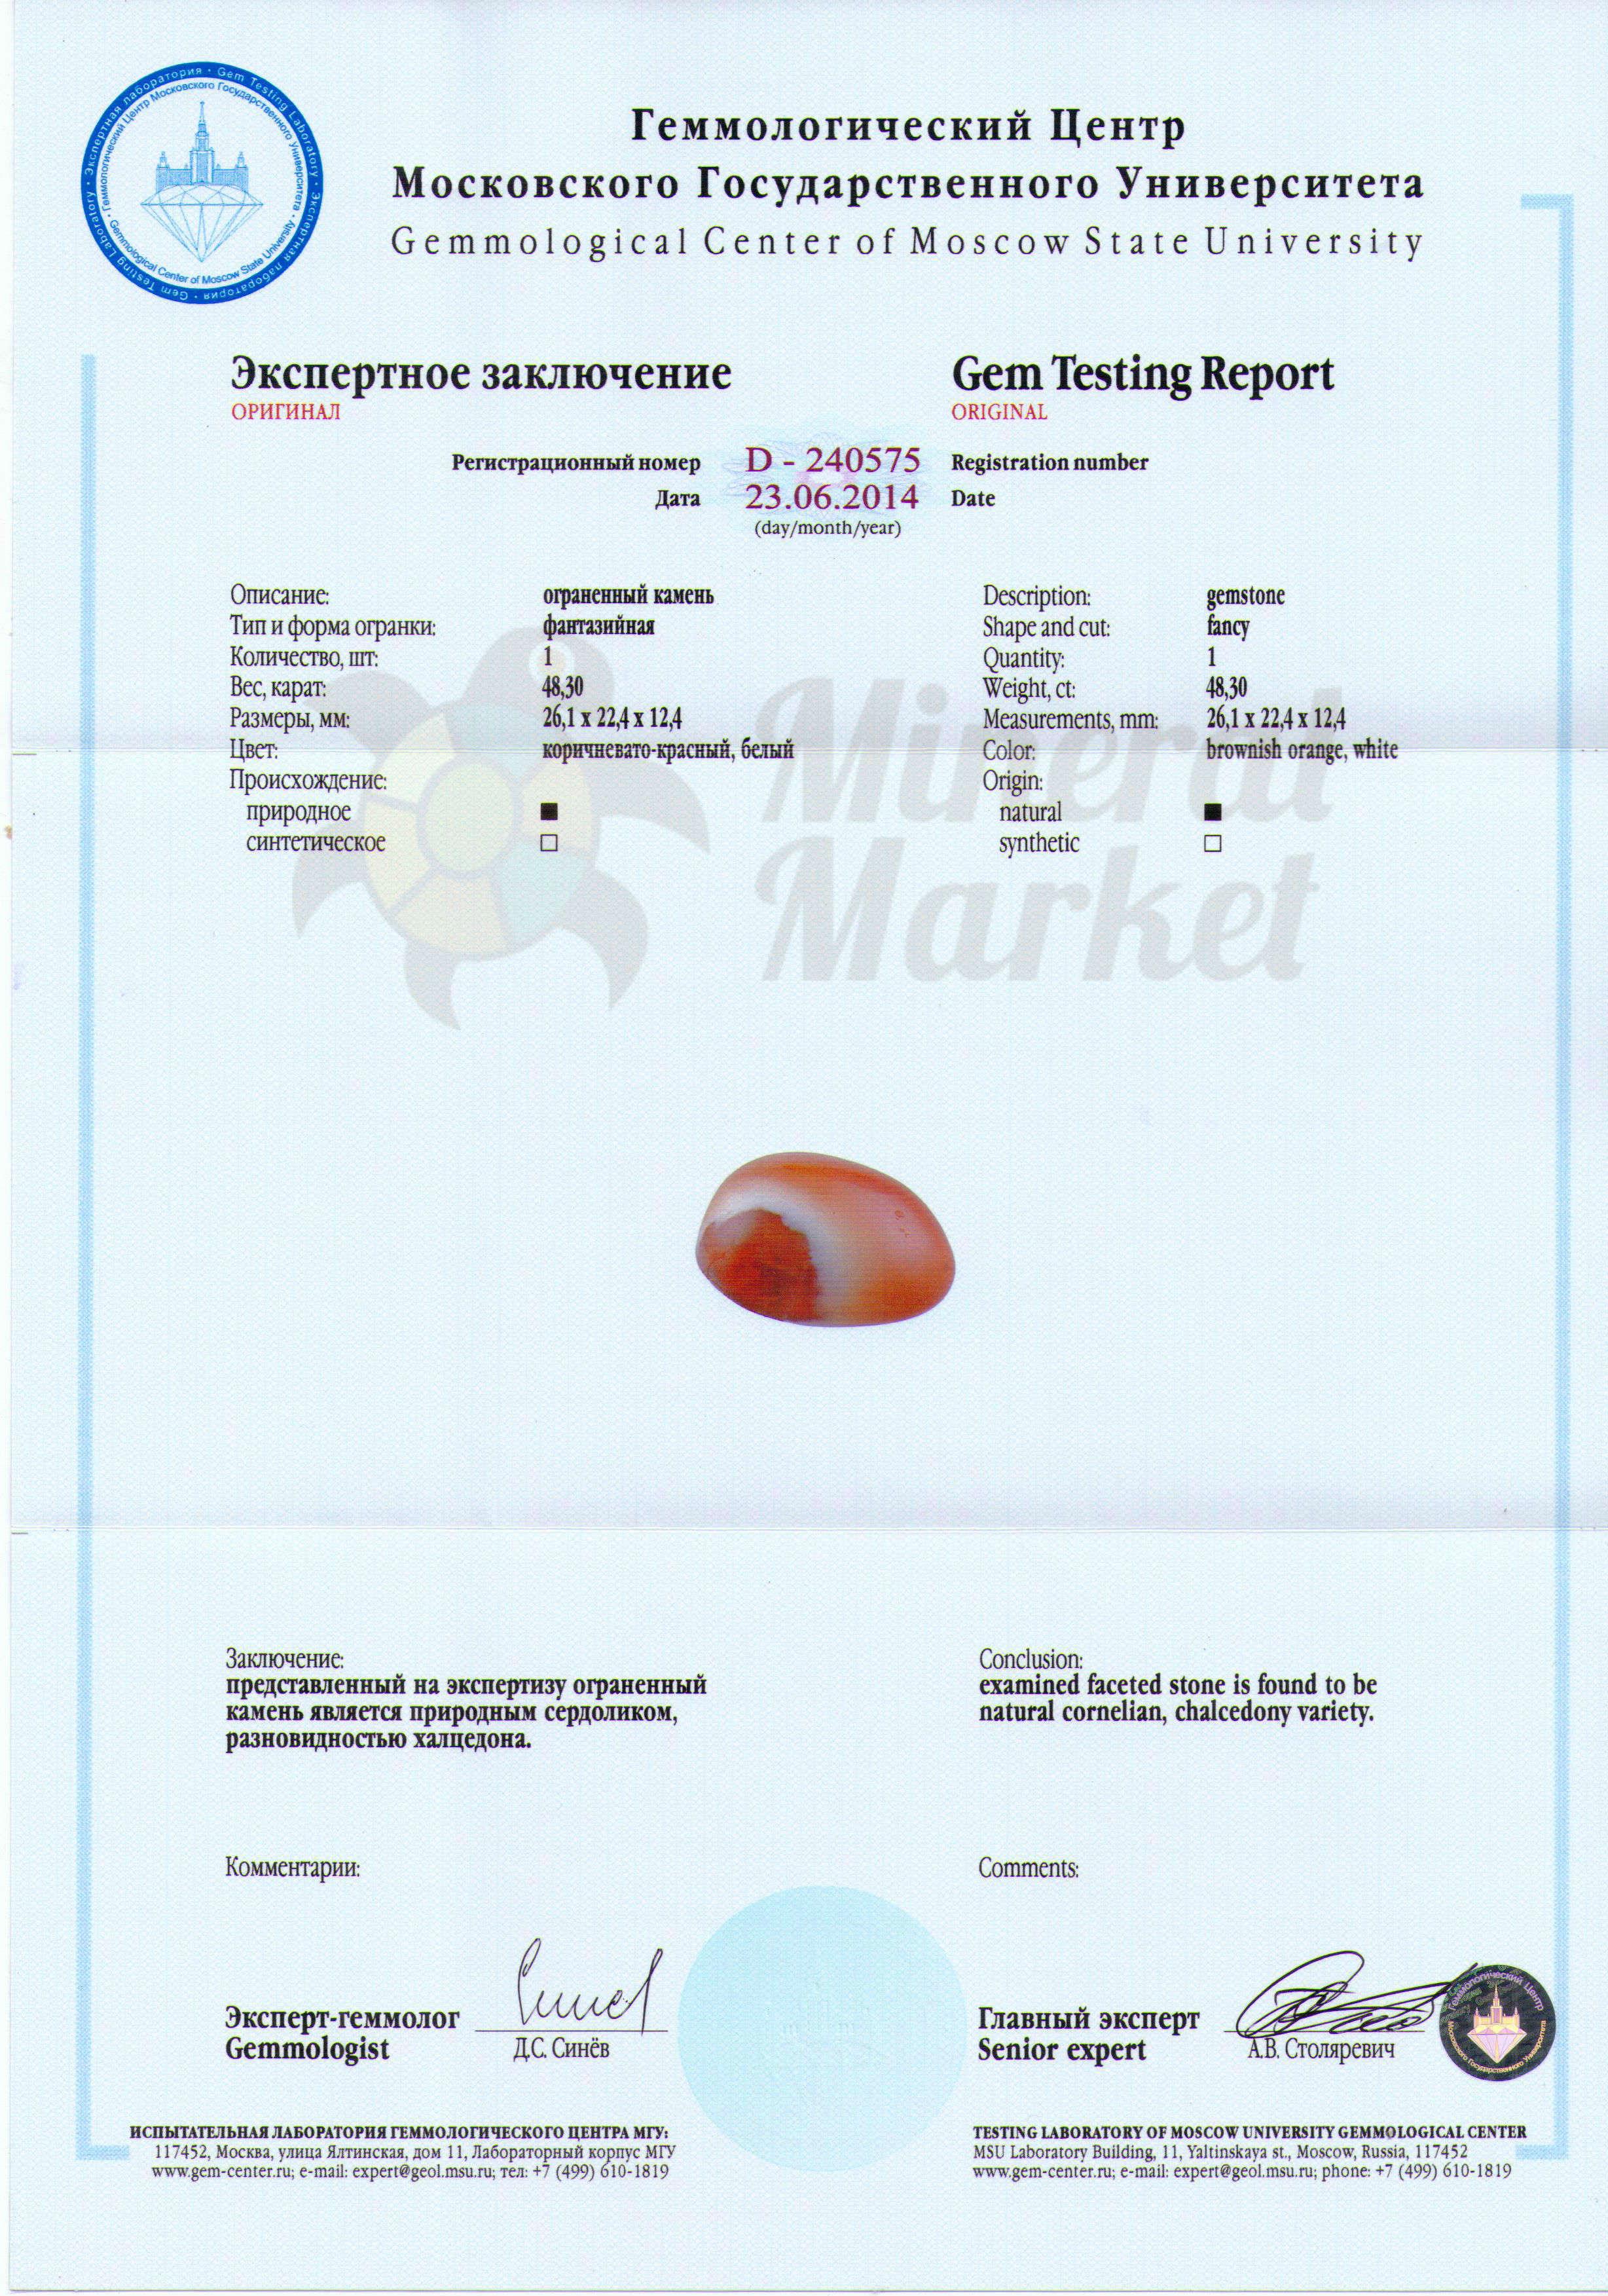 http://mineralmarket.ru/img/certificate/106.jpg